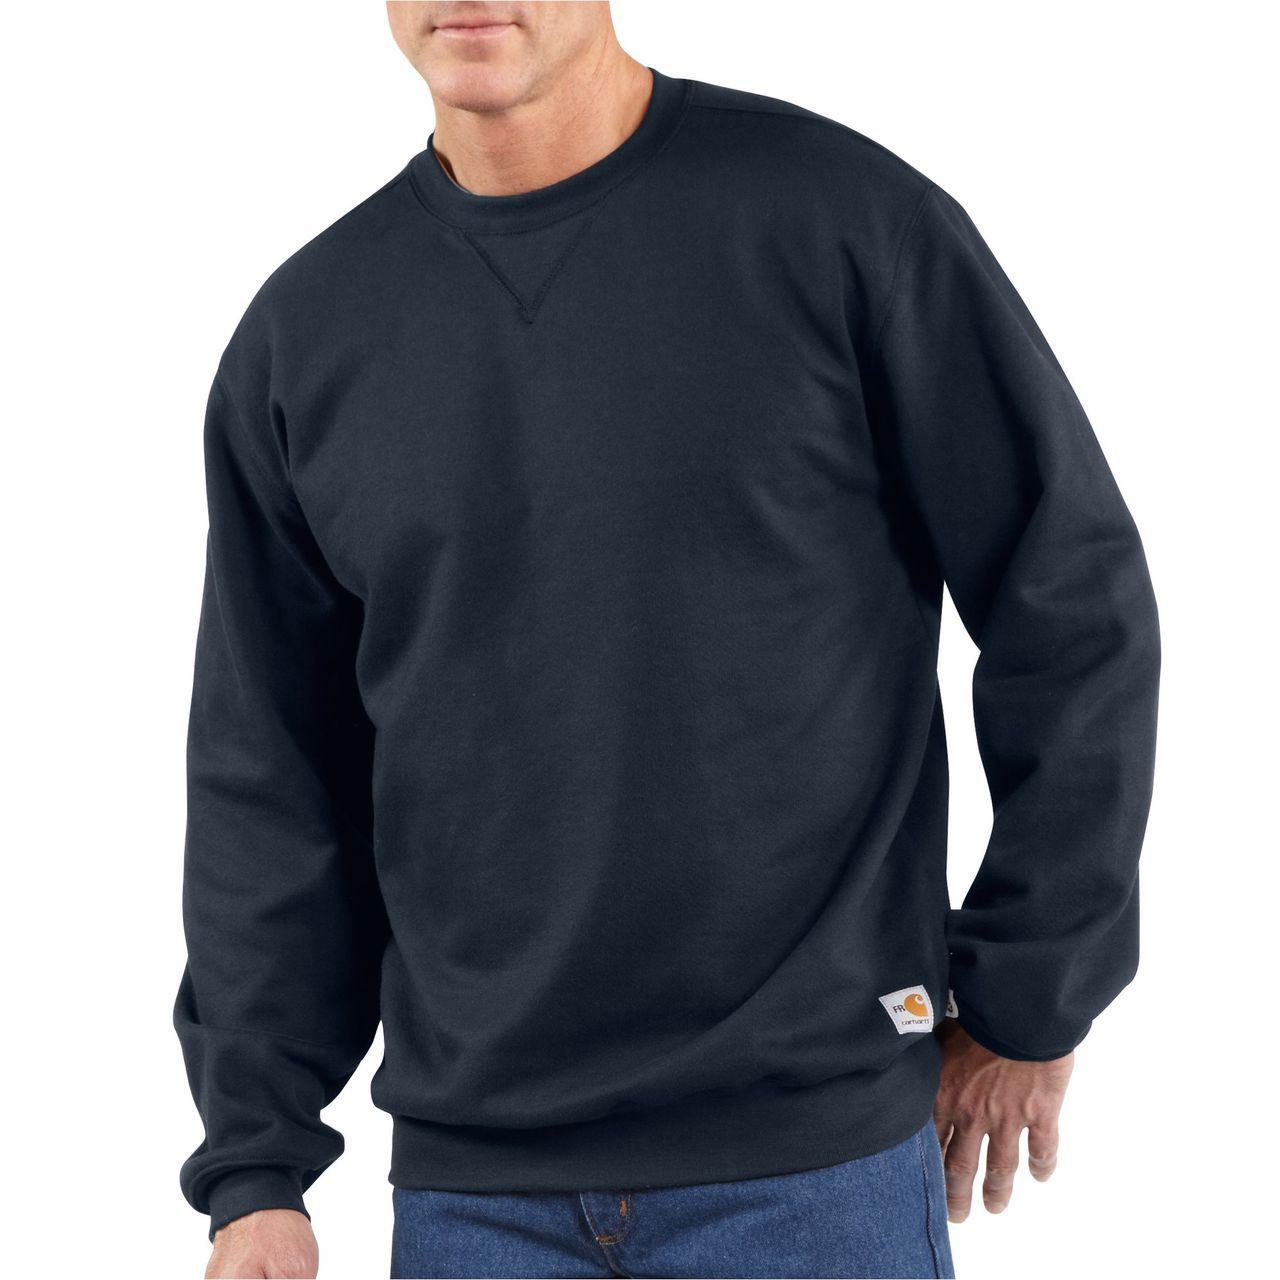 M Fr Hw Crewneck Sweatshirt Sweatshirts Long Sleeve Tshirt Men Carhartt Mens [ 1280 x 1280 Pixel ]